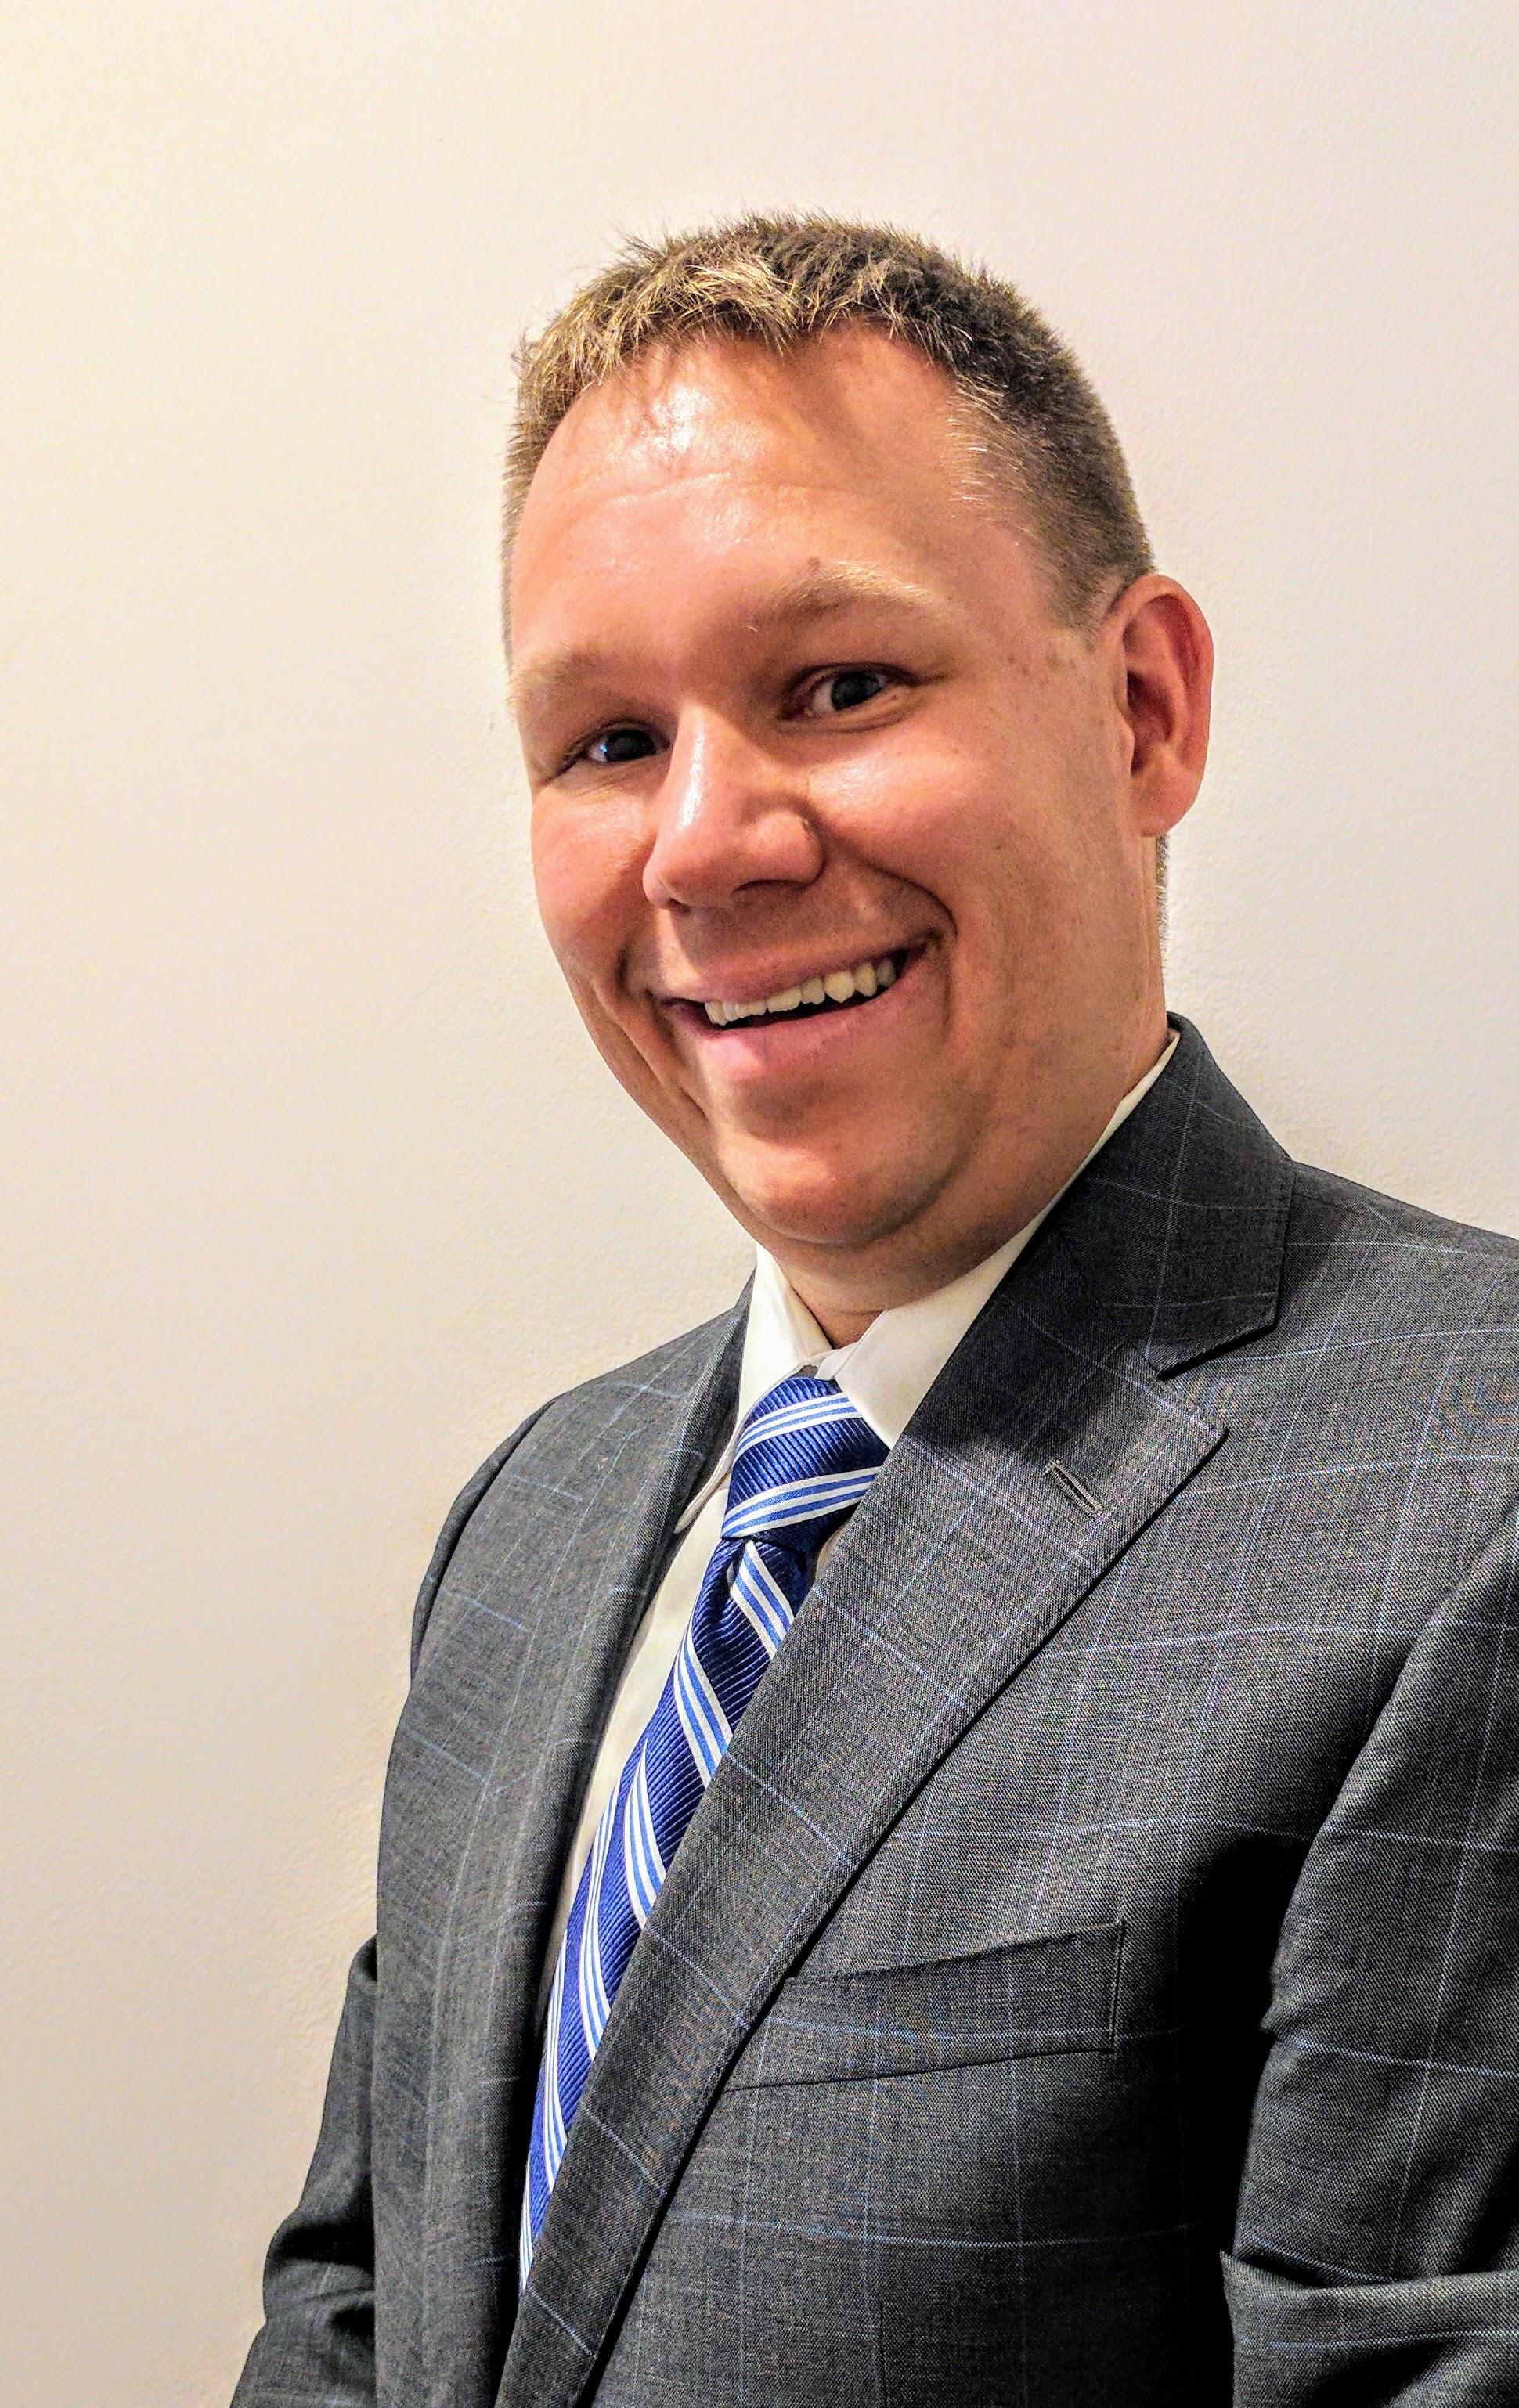 Andrew Roszak